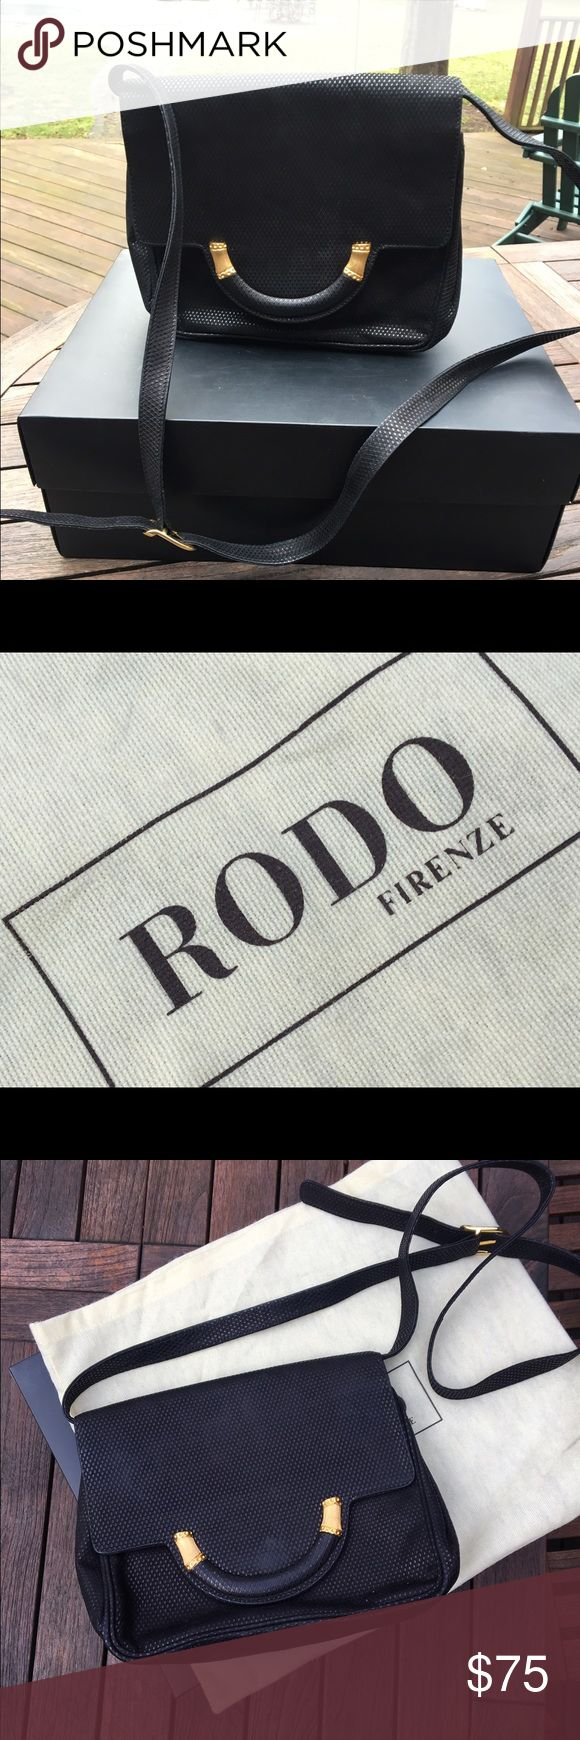 Selling this Rodo Firenze vintage leather shoulder bag, black. on Poshmark! My username is: sootied. #shopmycloset #poshmark #fashion #shopping #style #forsale #Rodo Firenze #Handbags